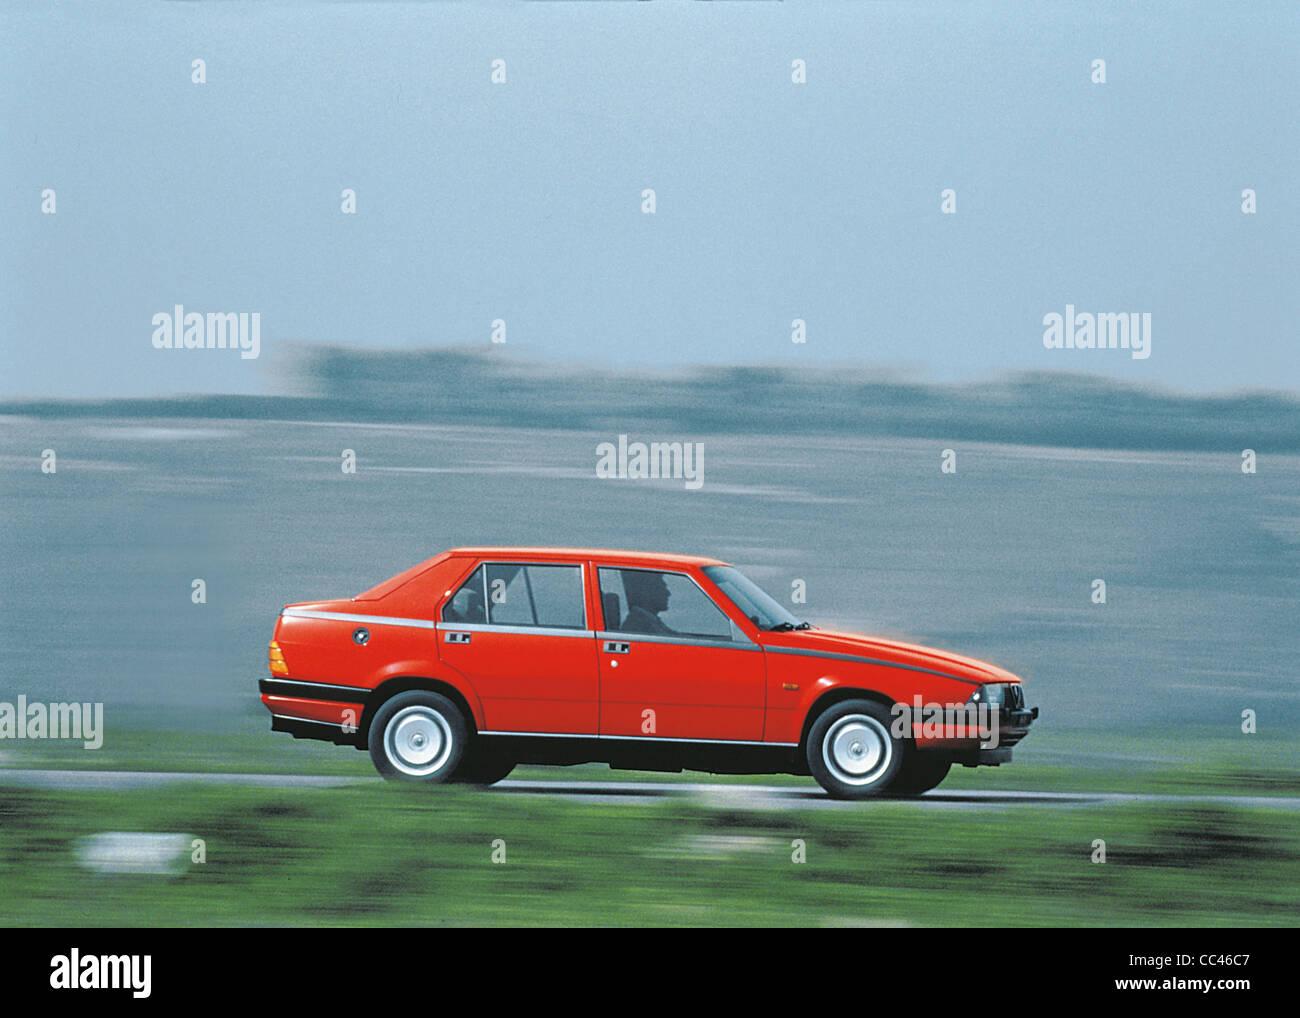 Auto des 20. Jahrhunderts Italien - Alfa Romeo Alfa 75. Jahre 1985-1988. Stockbild